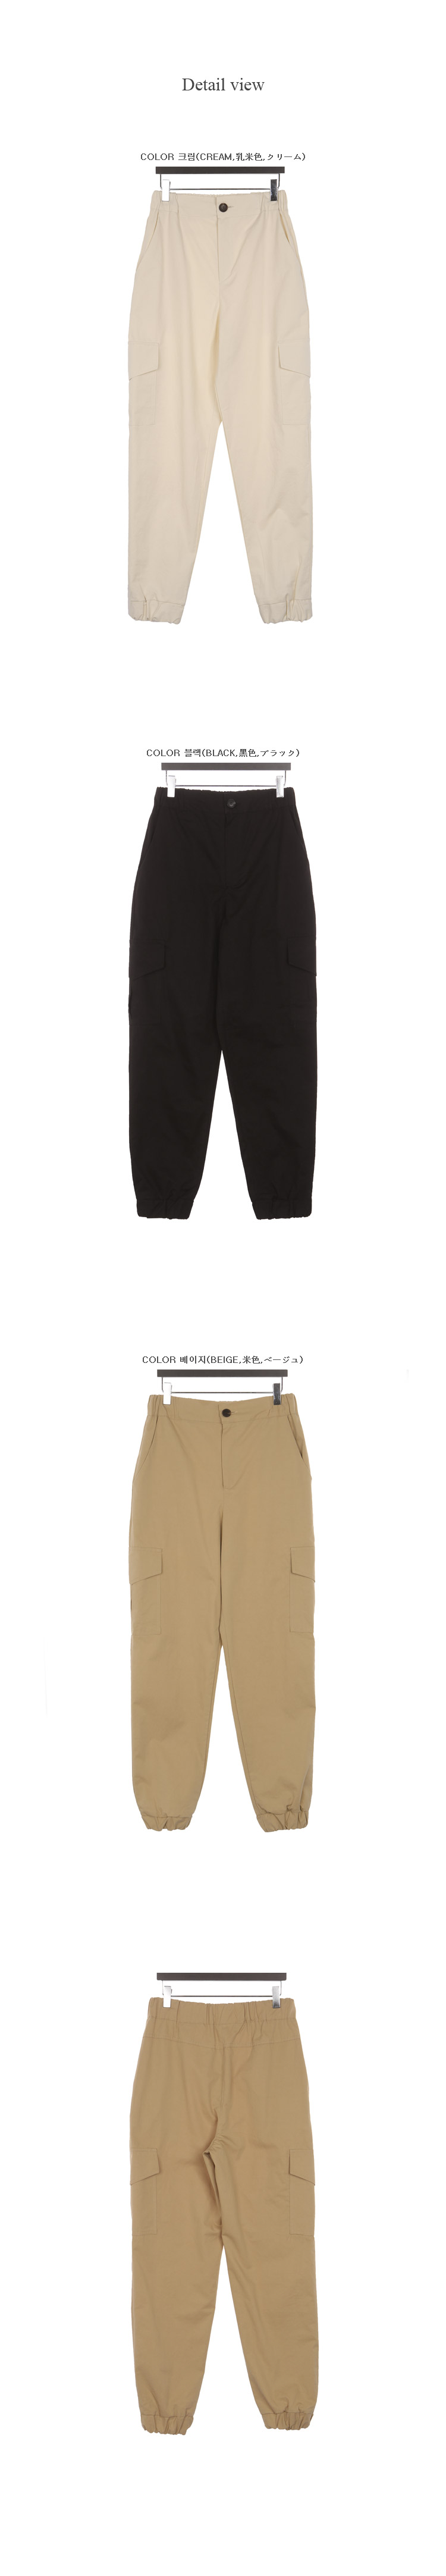 Bender pants